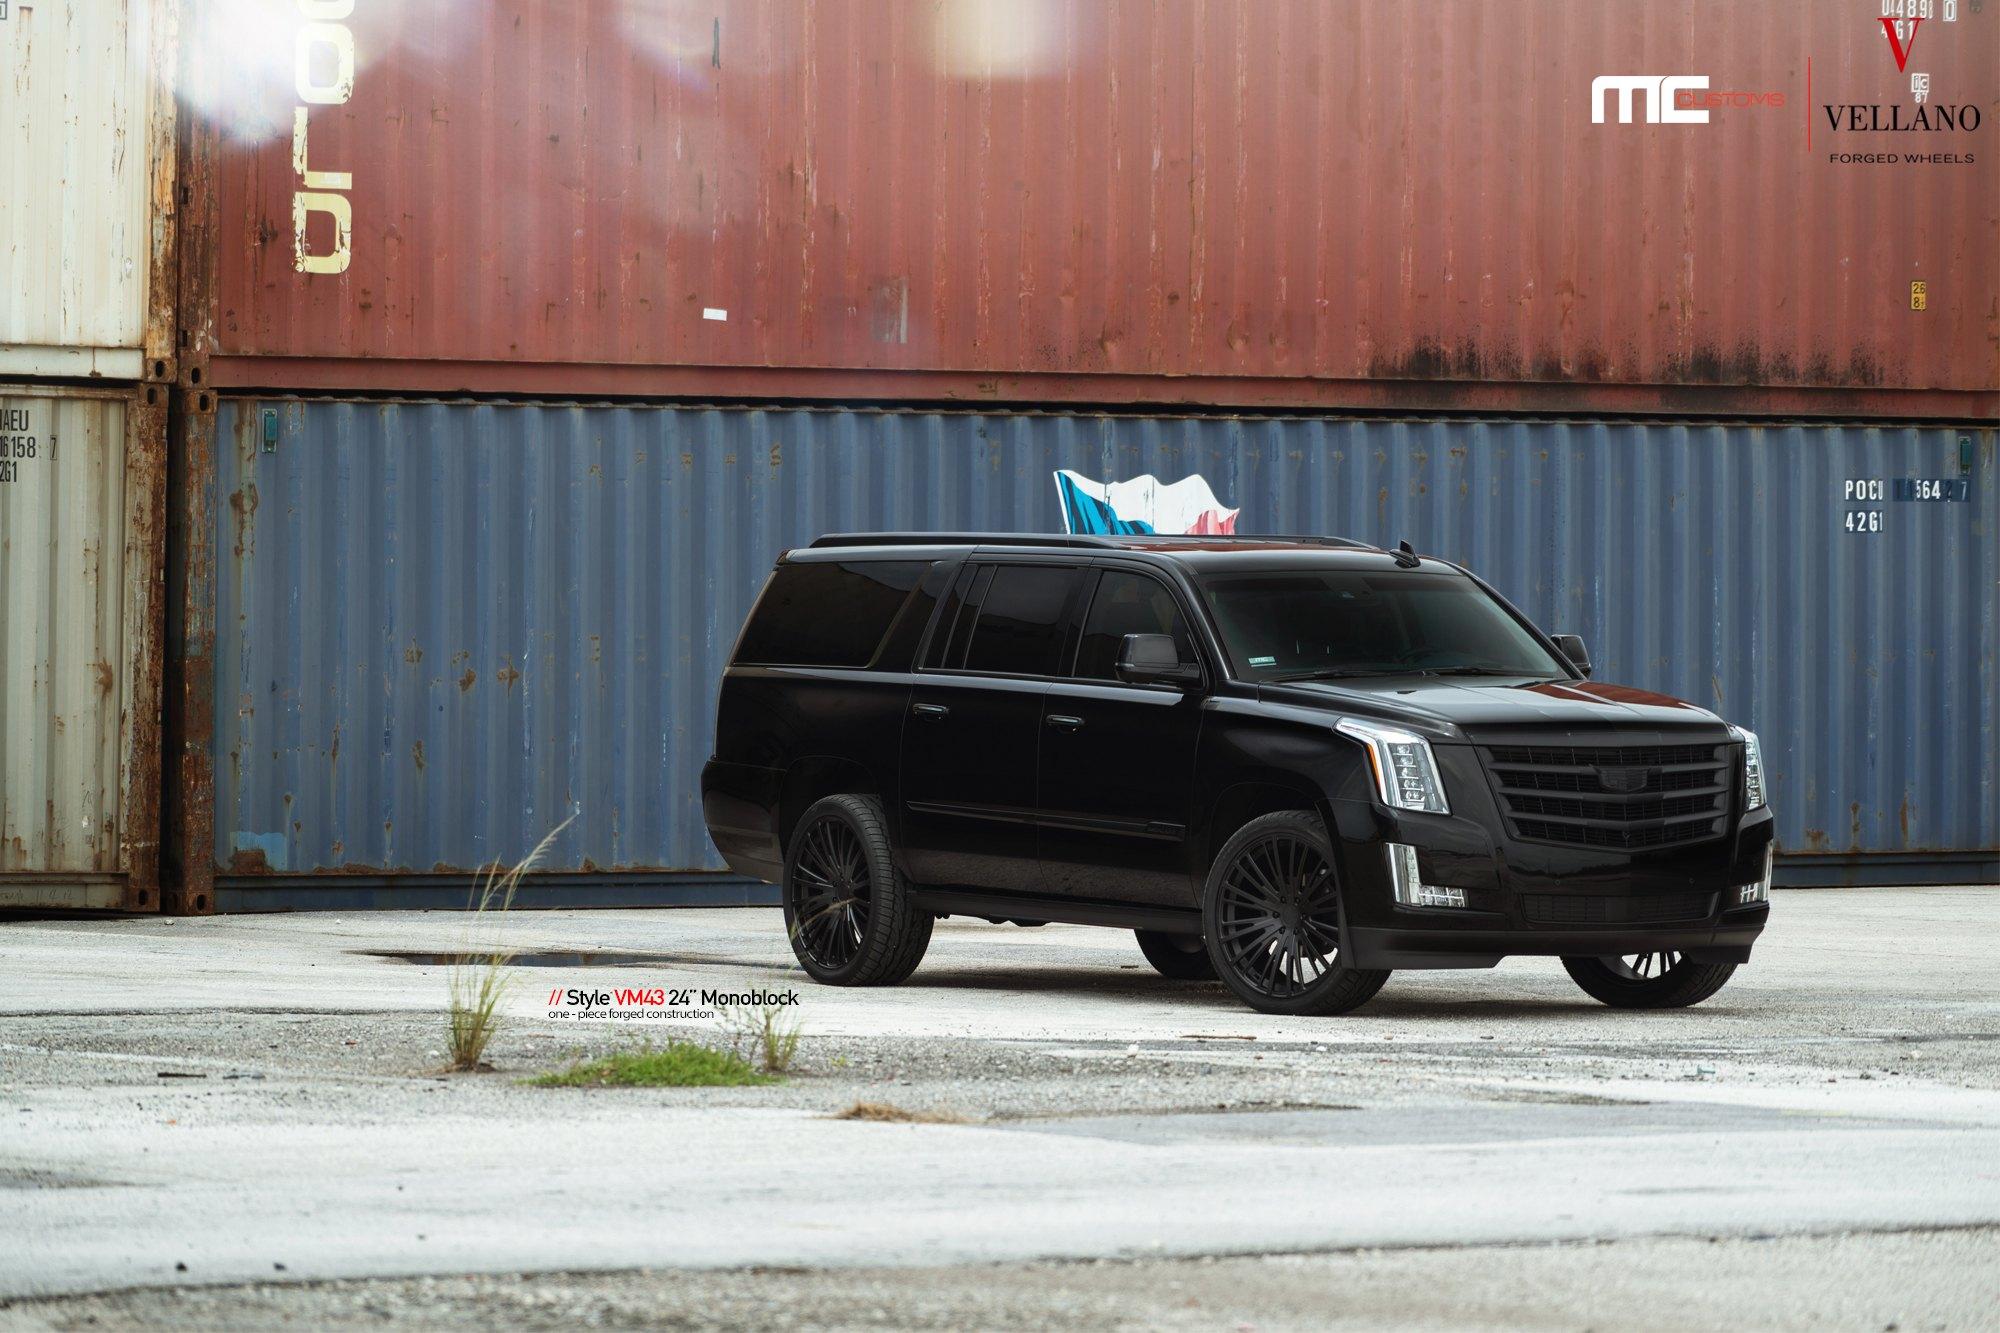 Black Cadillac Escalade With Crystal Clear LED Headlights